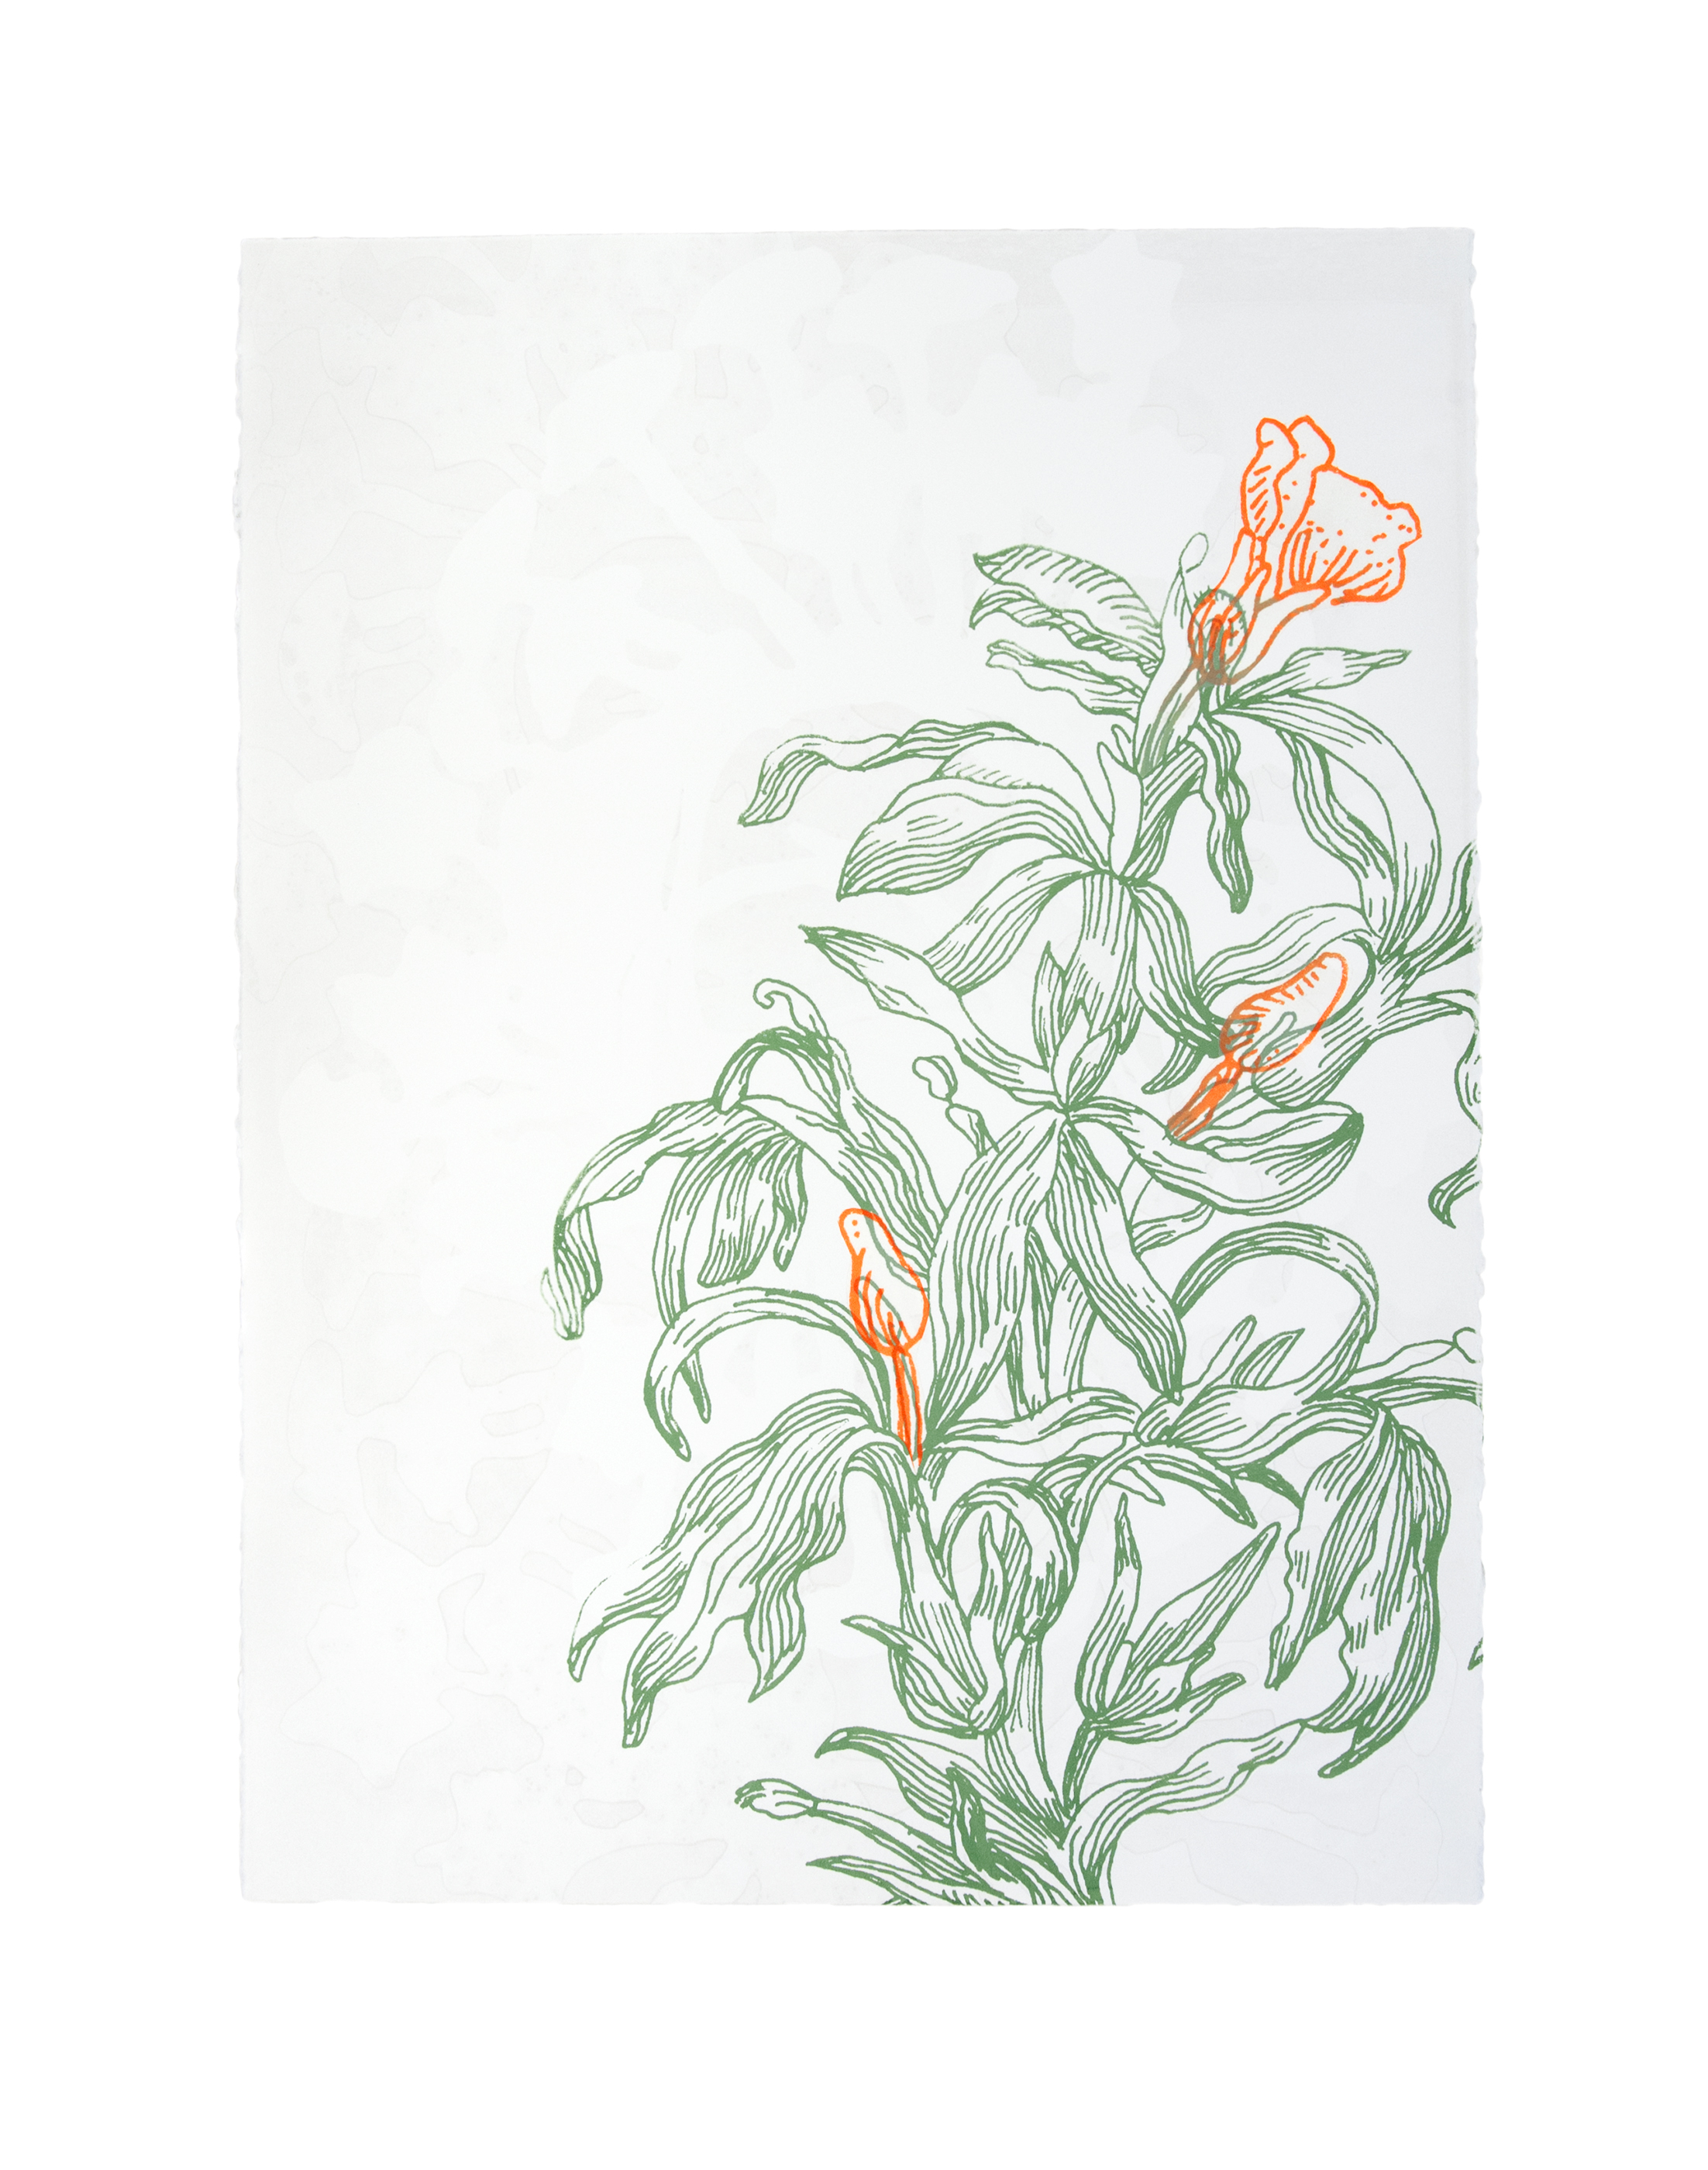 Future Flower I